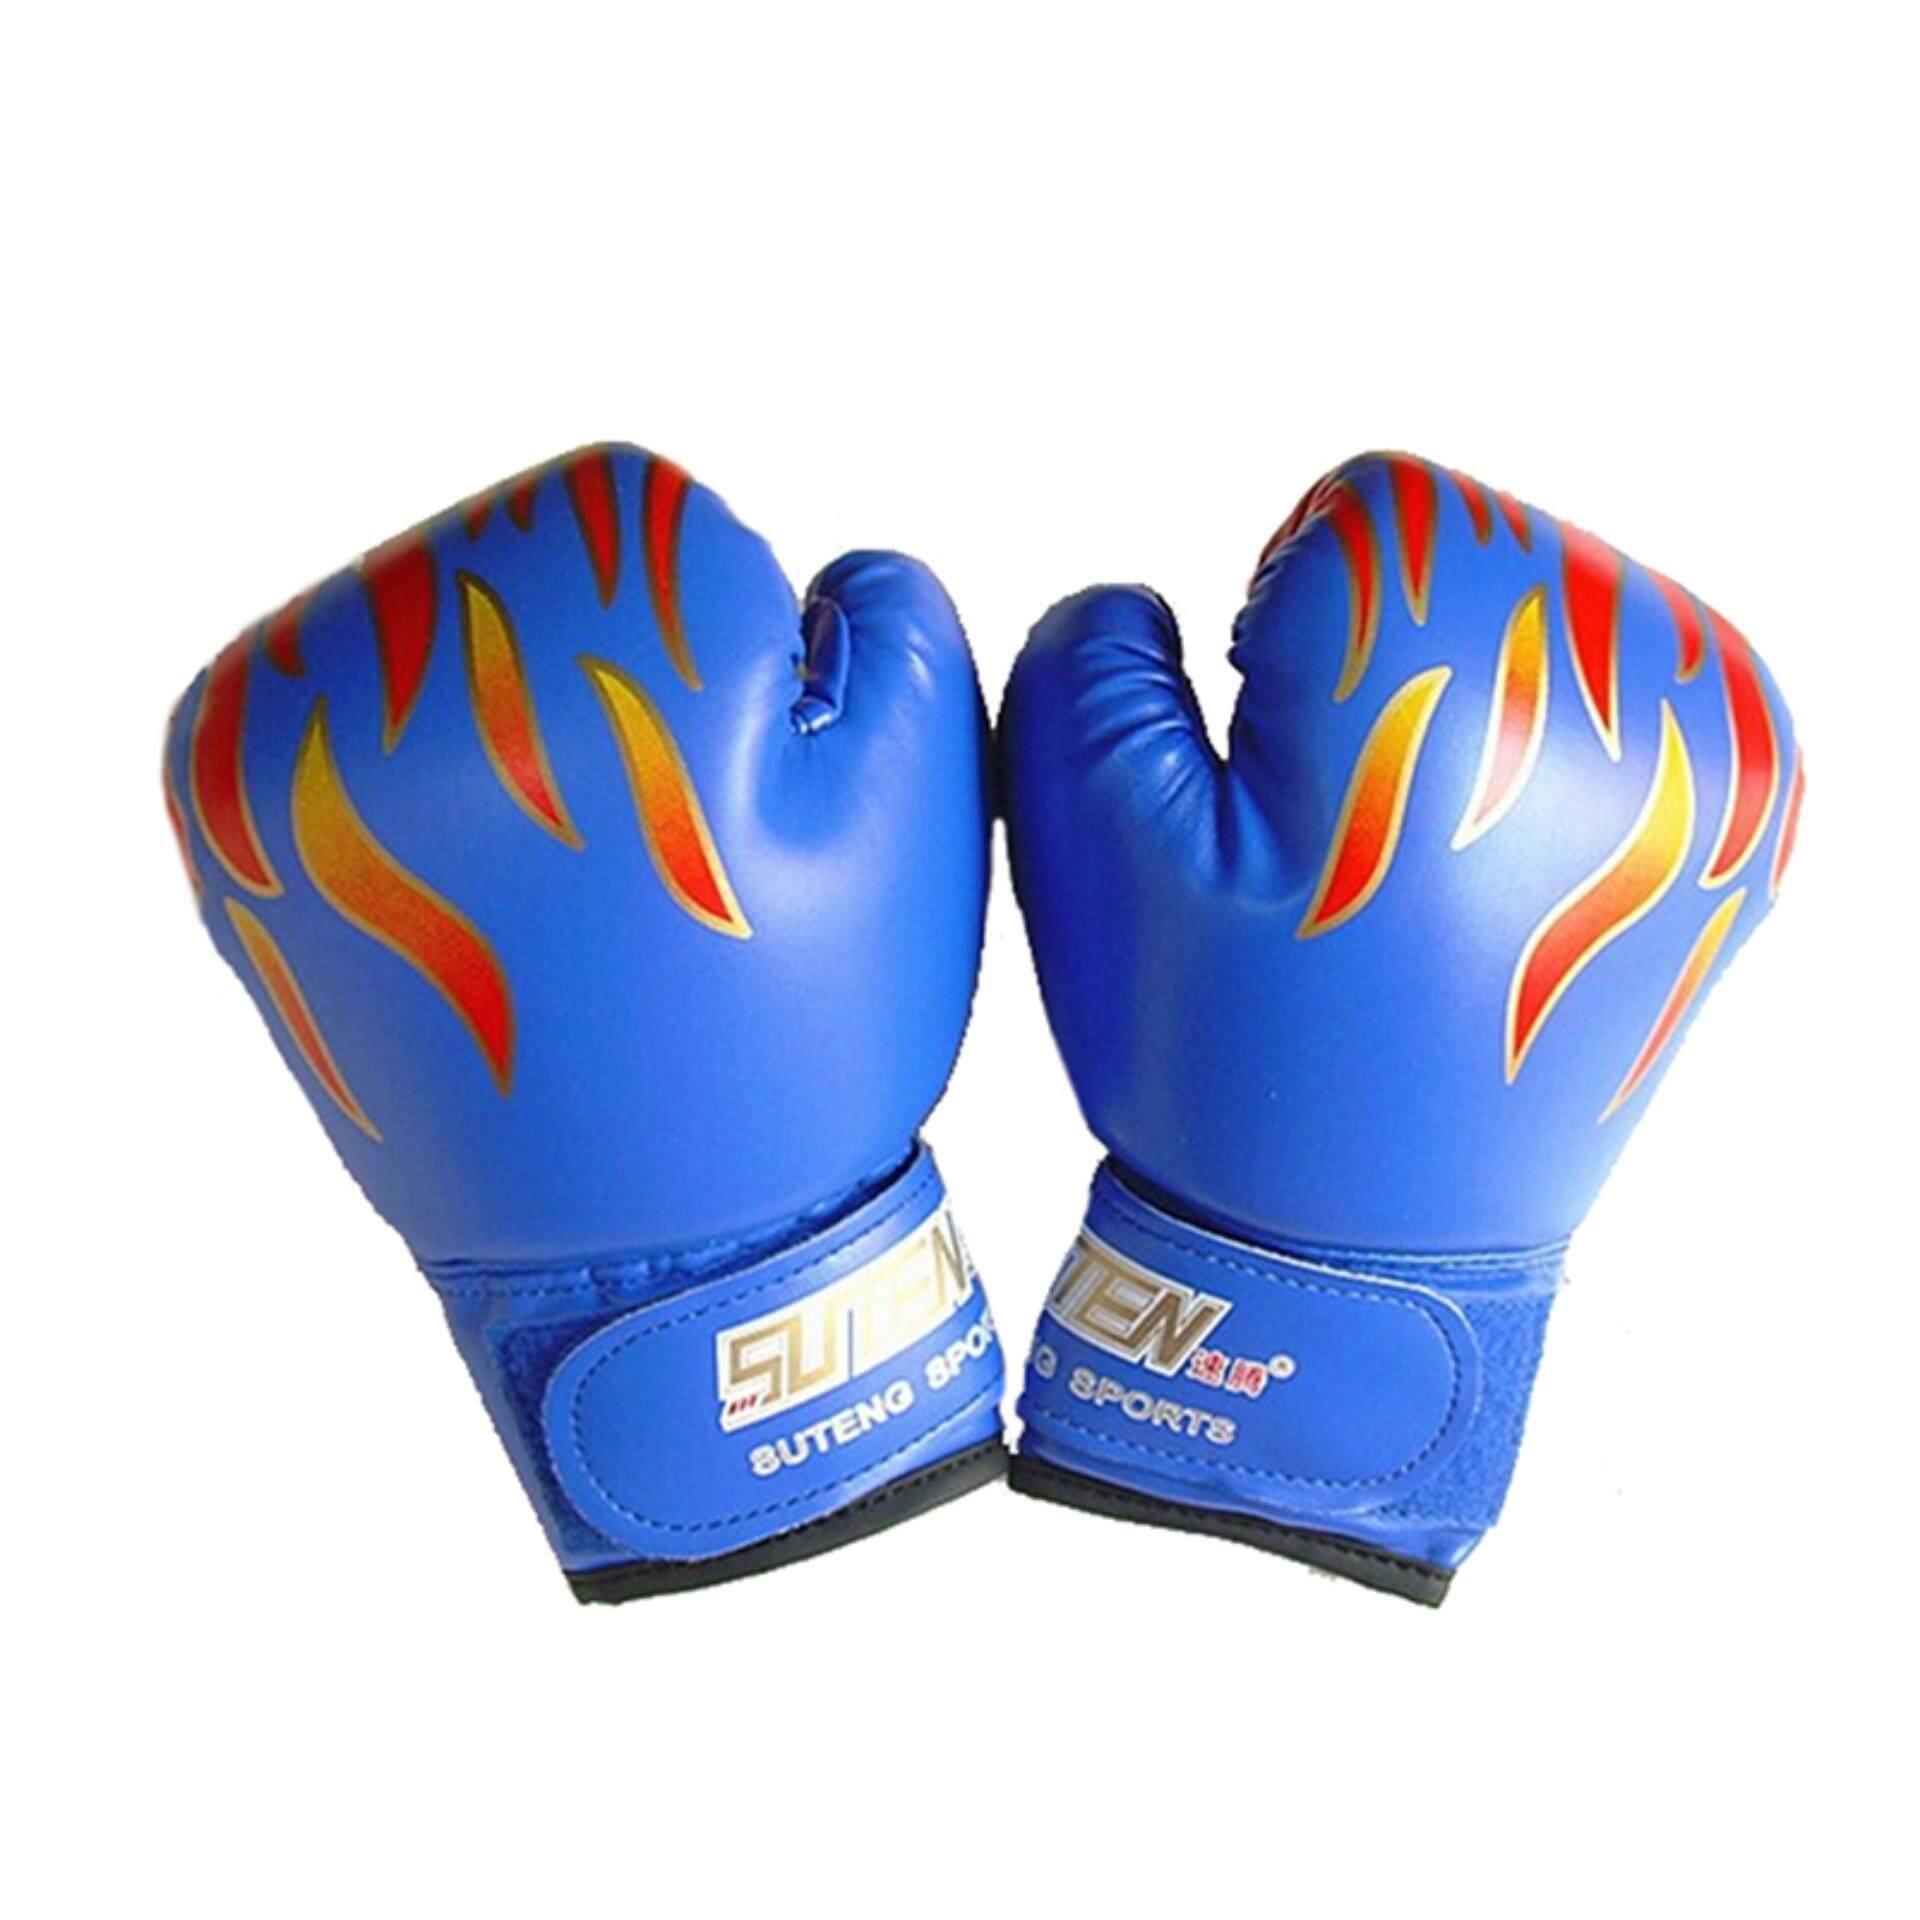 Anak Anak Api Sarung Tangan Latihan Tinju Punching Melawan Pelatihan Usia 3-12 By Buy Tra.